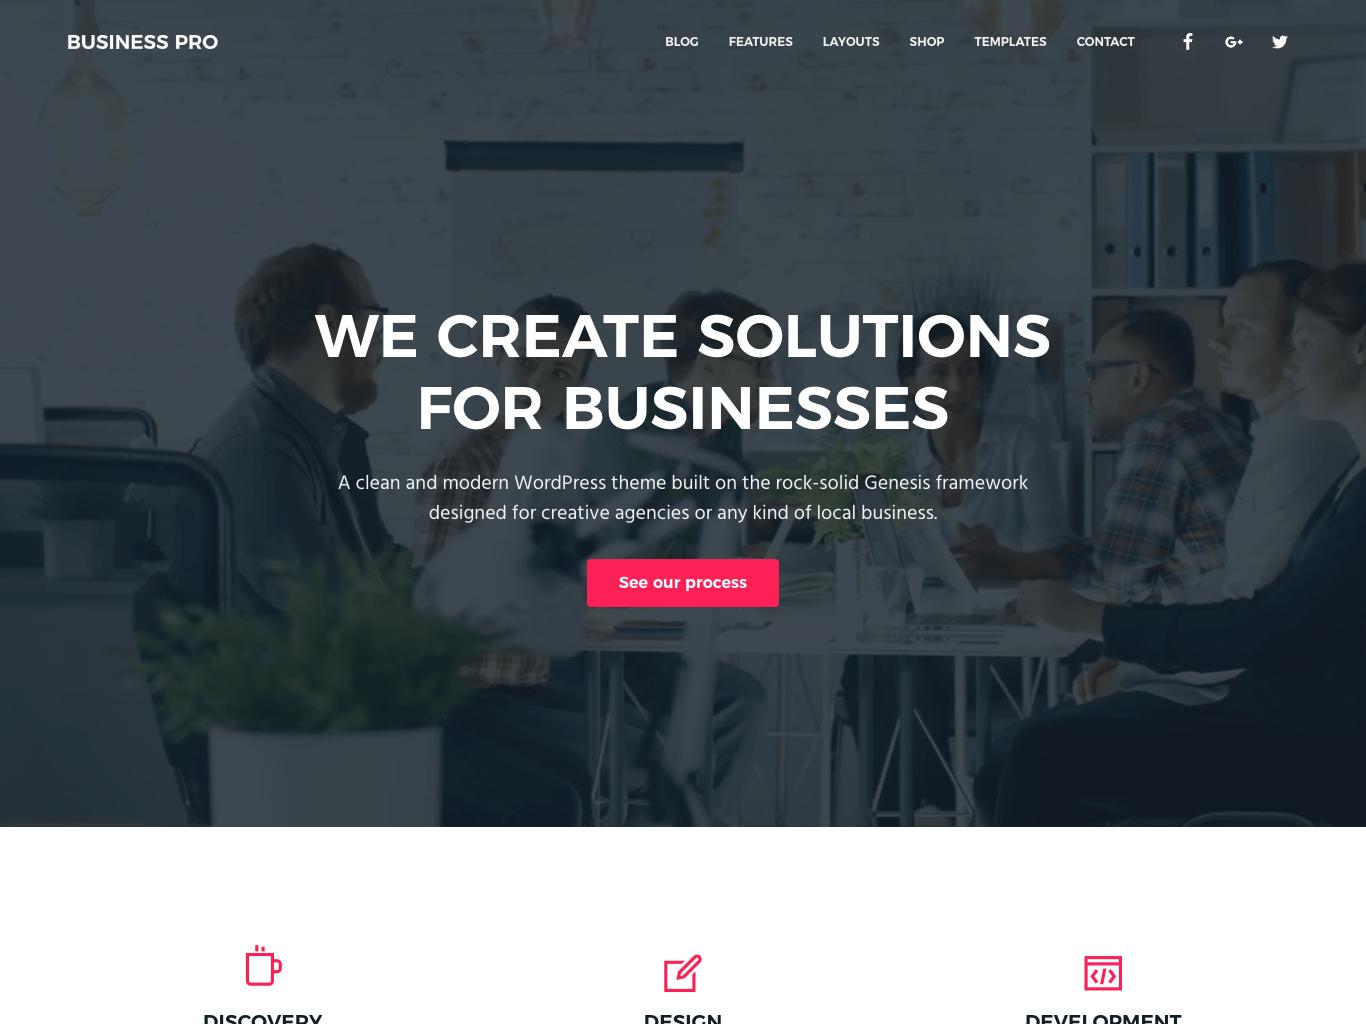 Business Pro 1.0.4 Theme by SEO Themes – My StudioPress